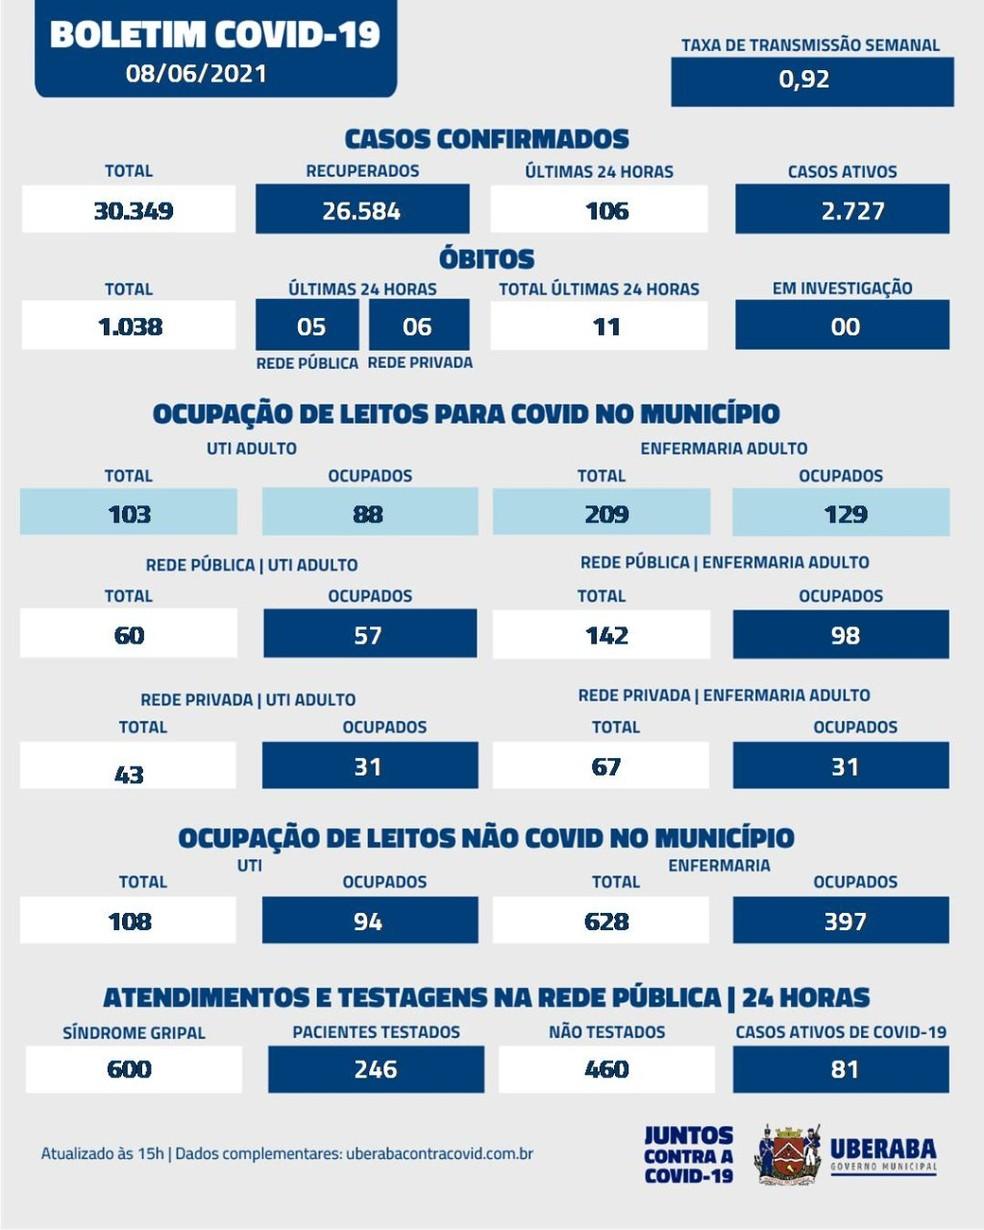 Boletim coronavírus de Uberaba do dia 08/06/2021 — Foto: Prefeitura de Uberaba/Divulgação